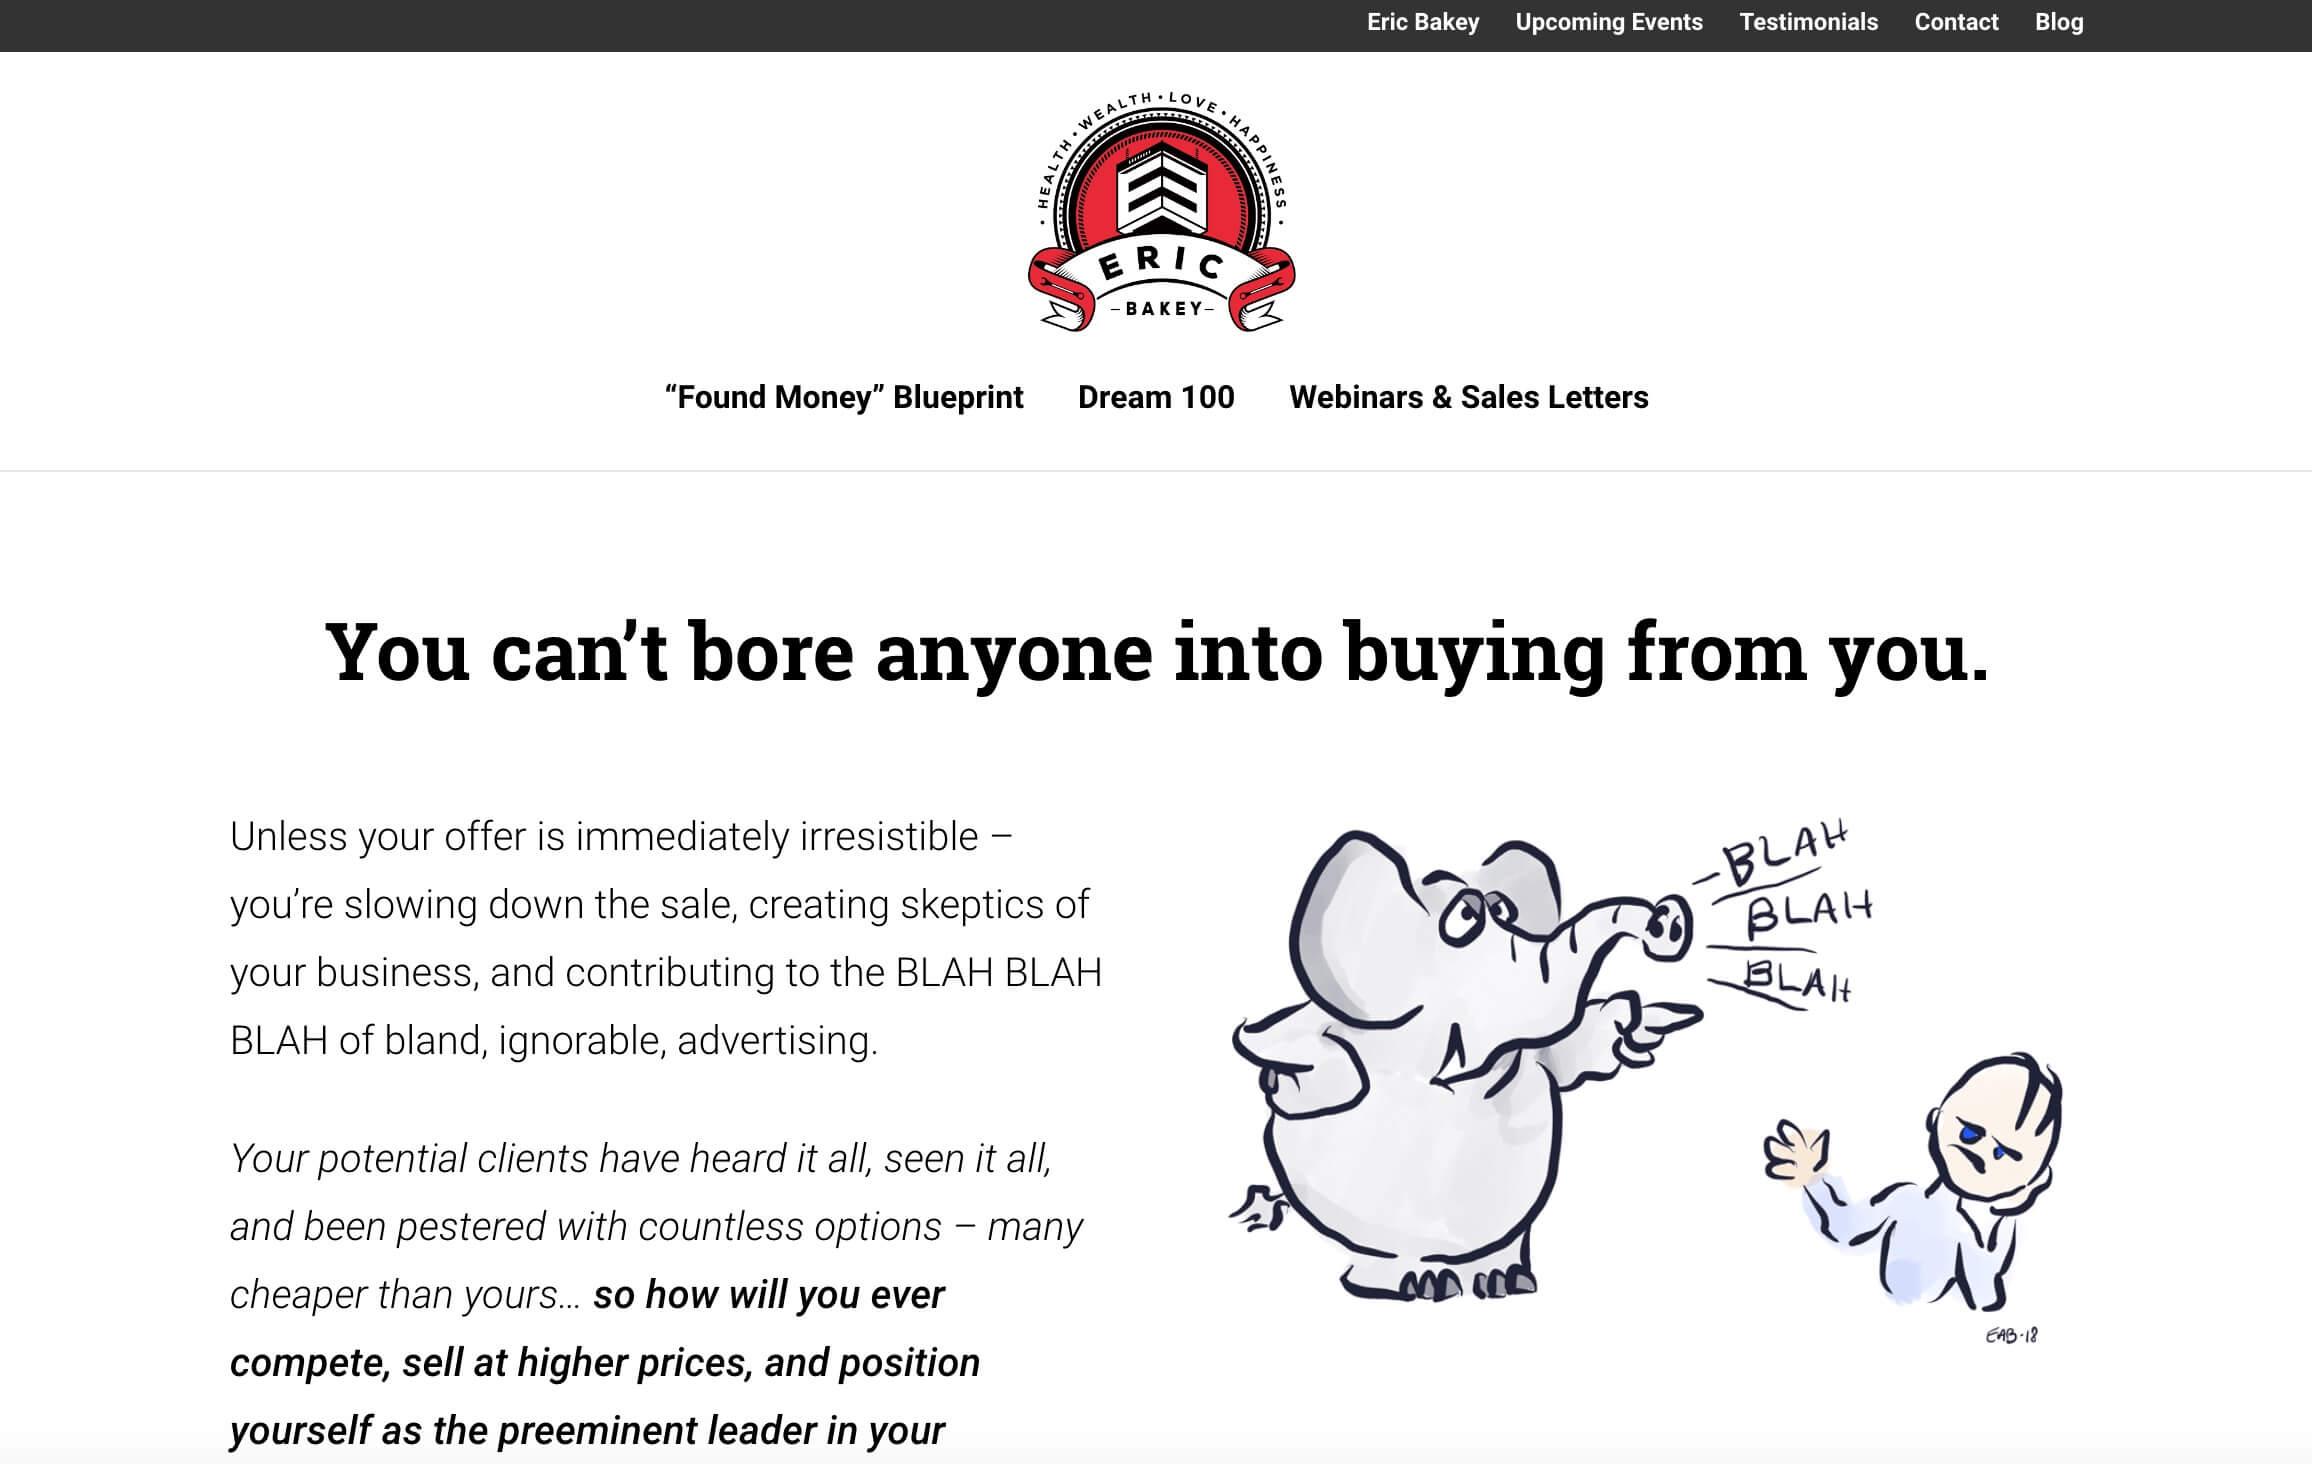 Eric Bakey Website